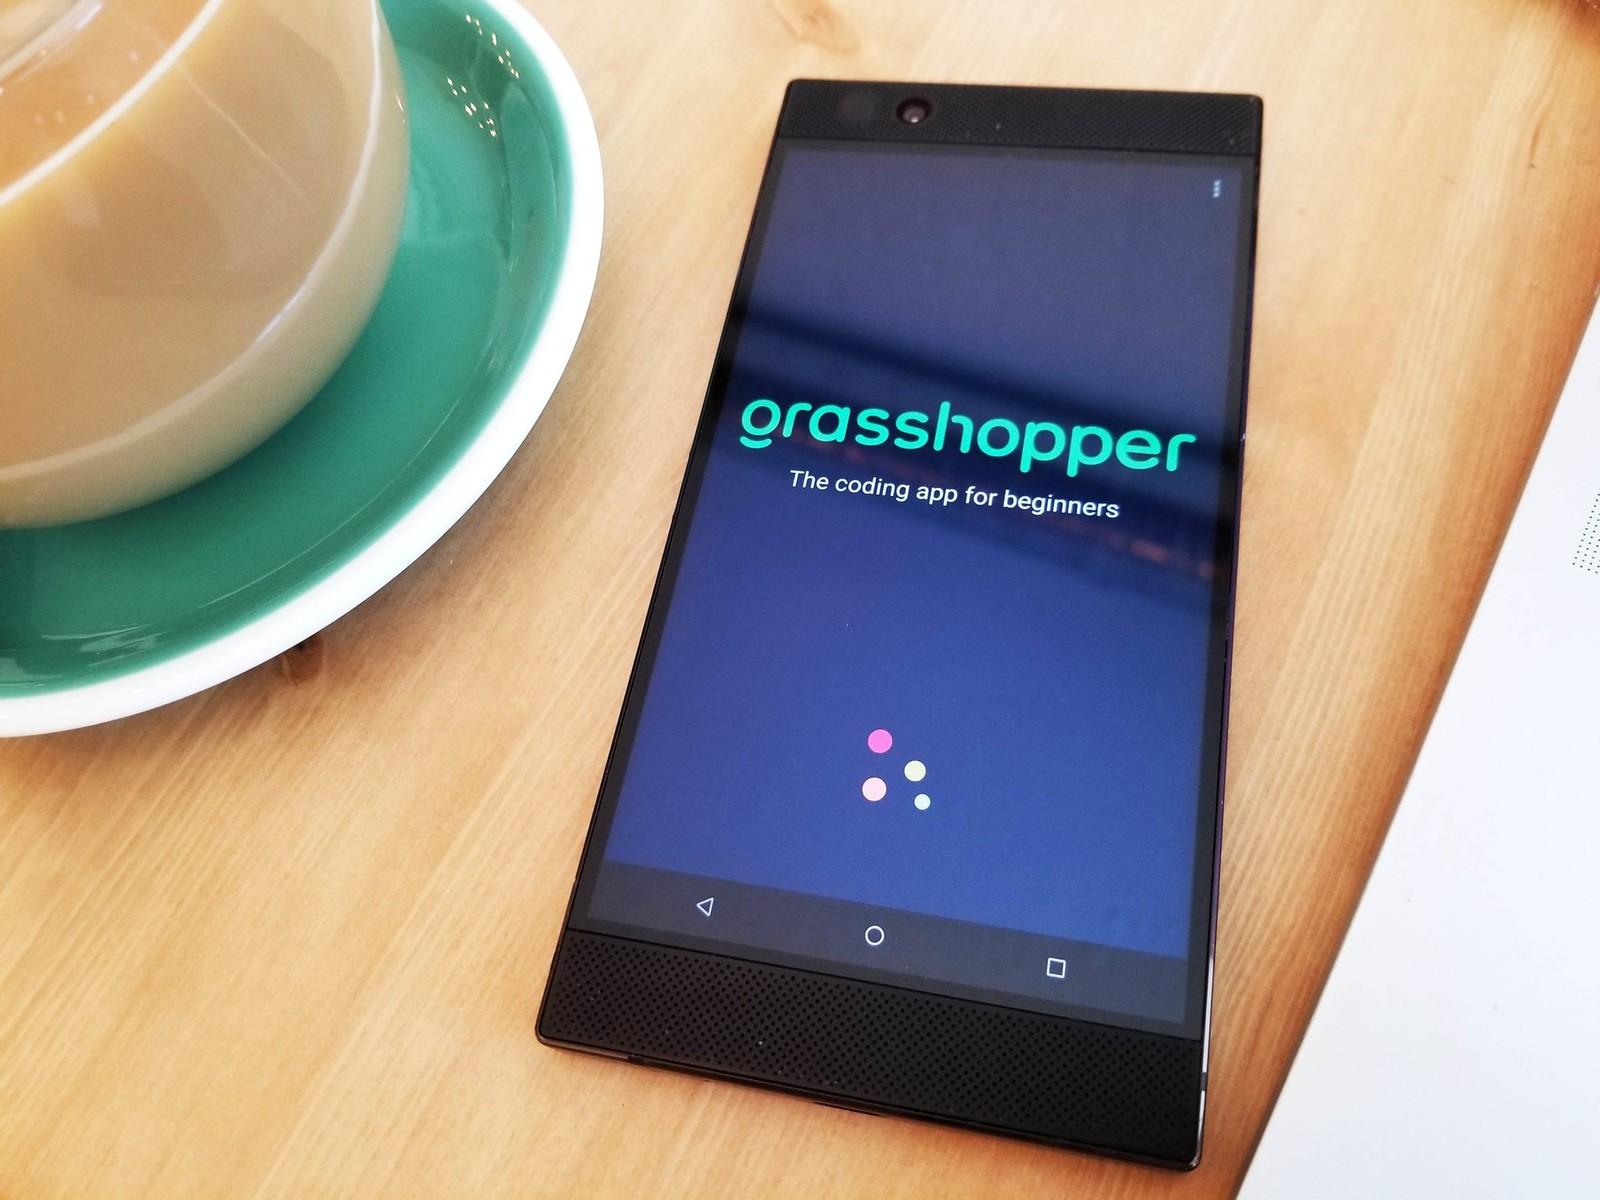 Google's Grasshopper app teaches you how to code - The